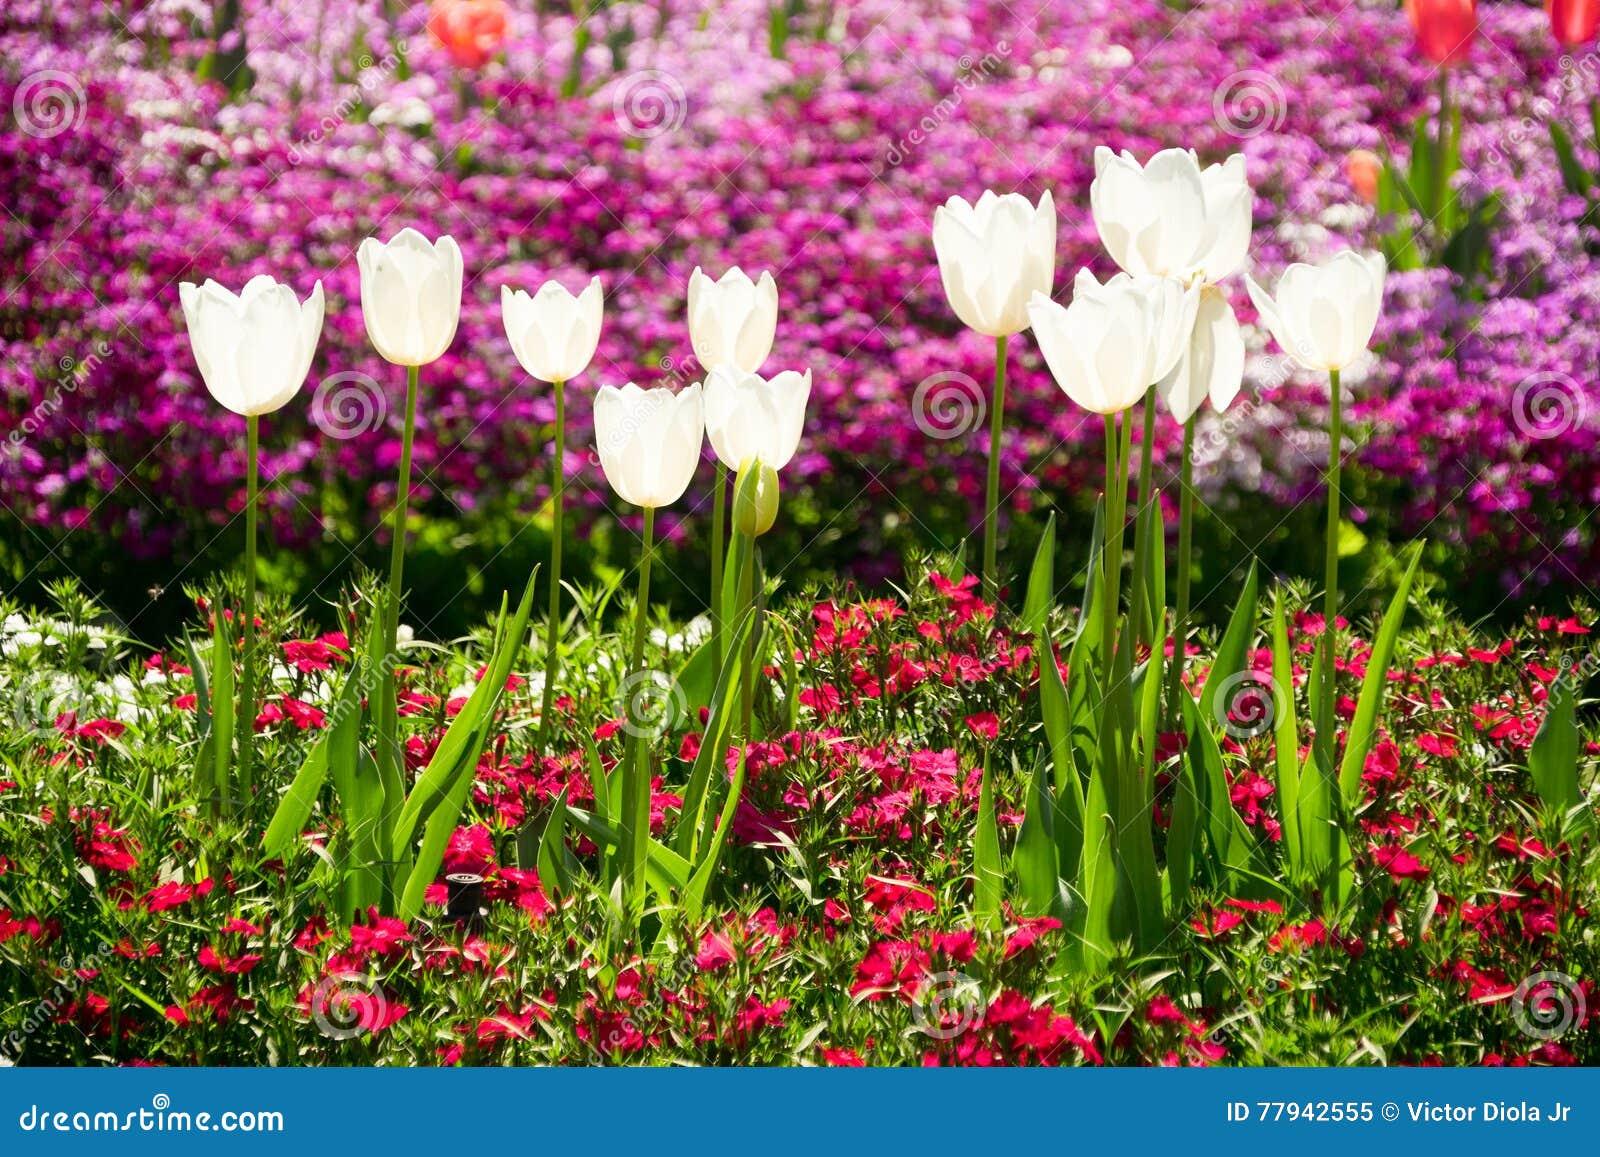 Toowoomba Flower Festival Tulip Flowers Stock Image Image Of